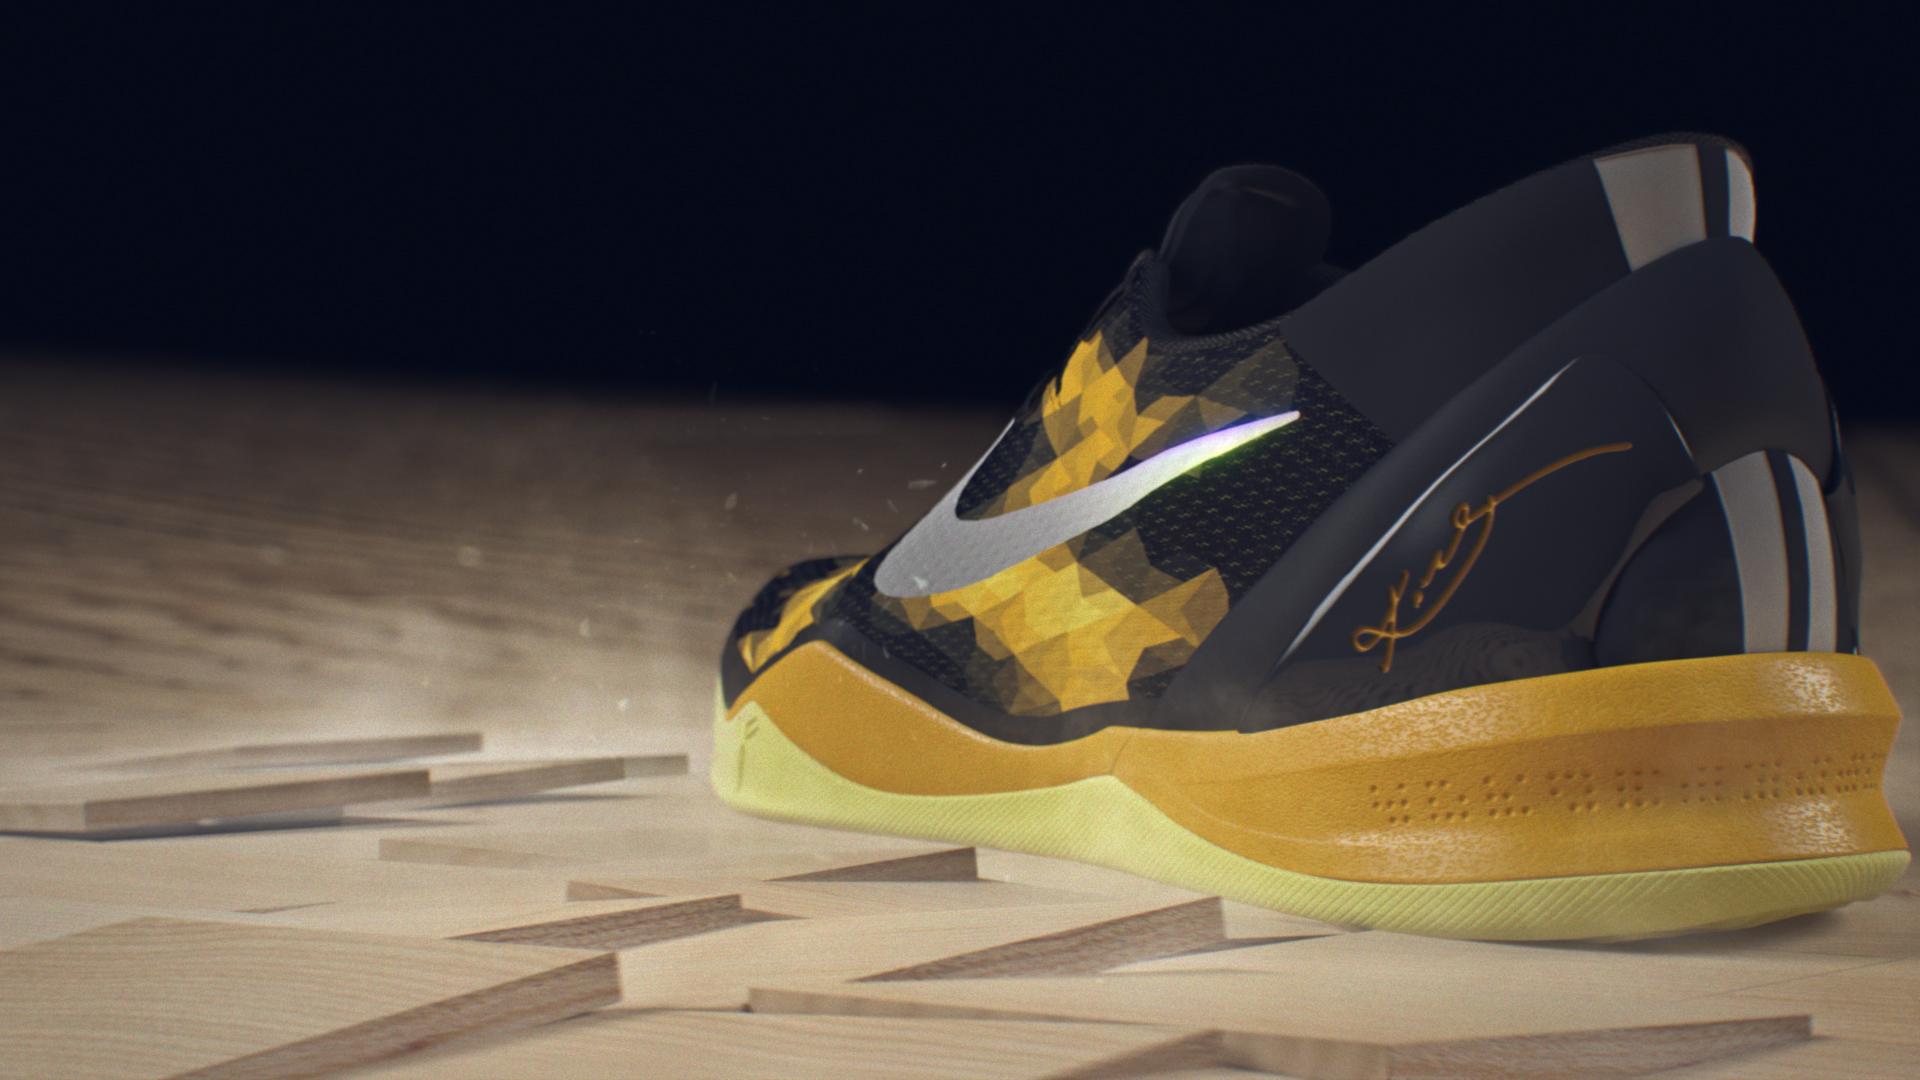 Nike_Kobe8_Directors_Cut_19_12_12 (00708).jpg